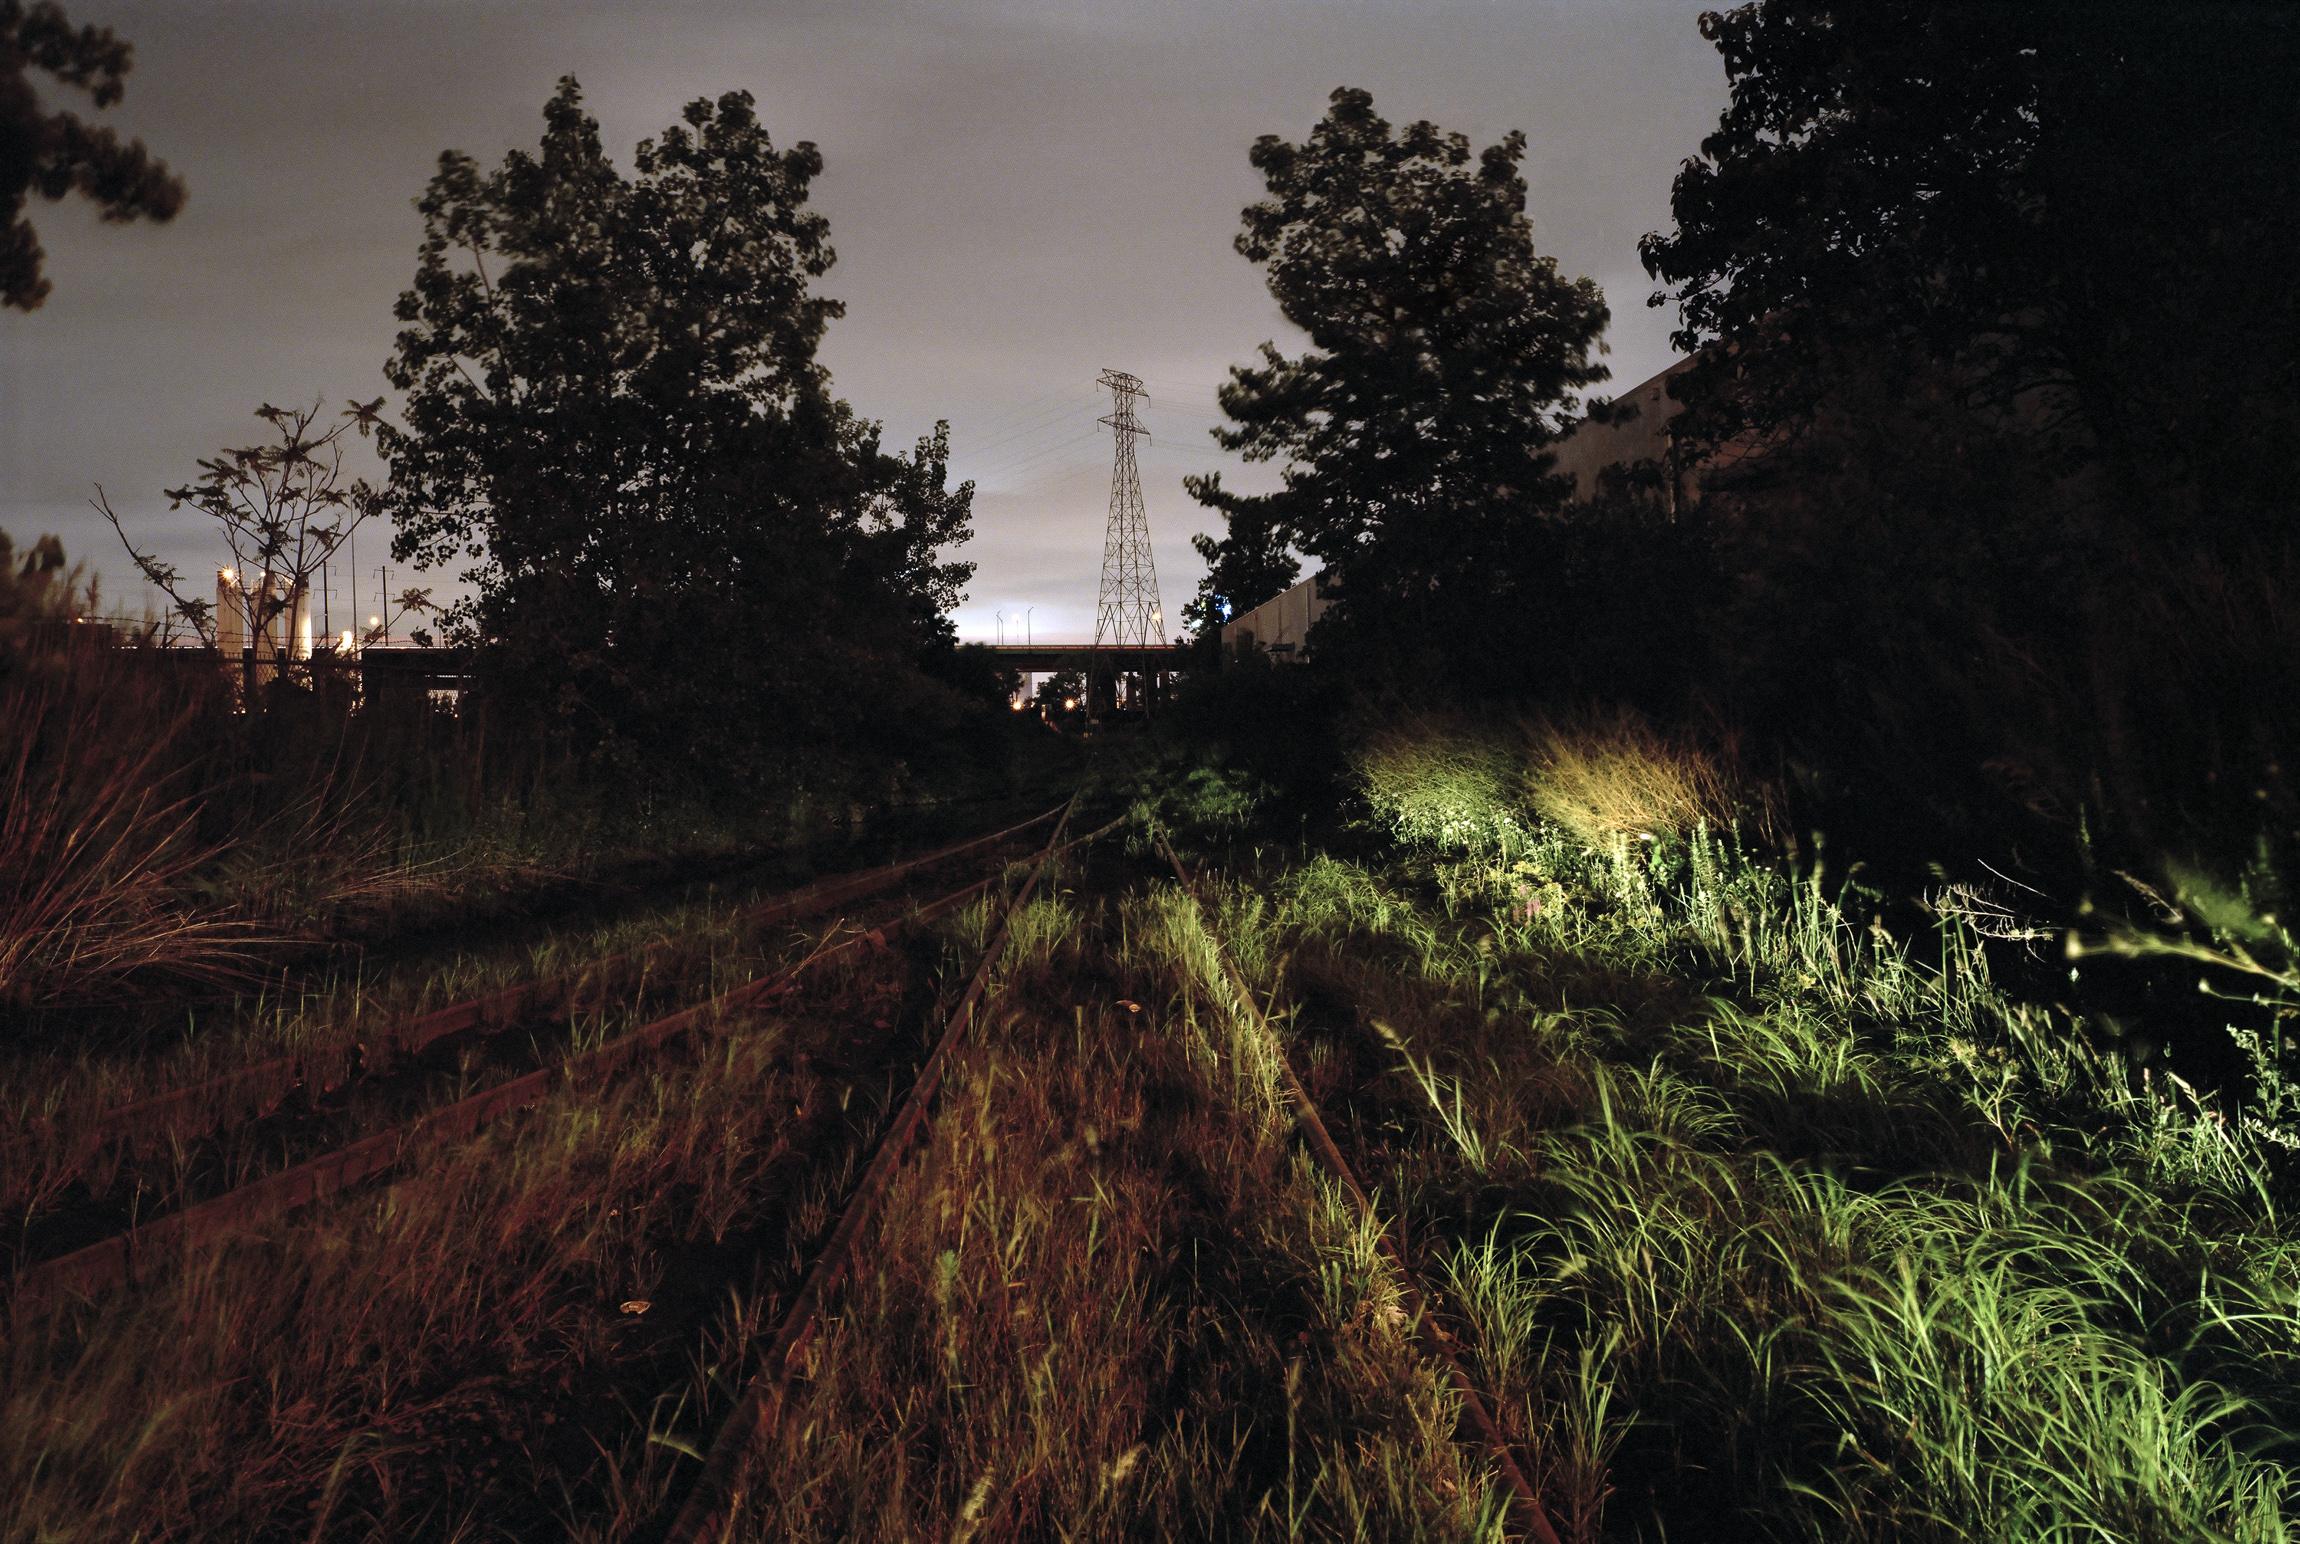 Tracks - New Jersey